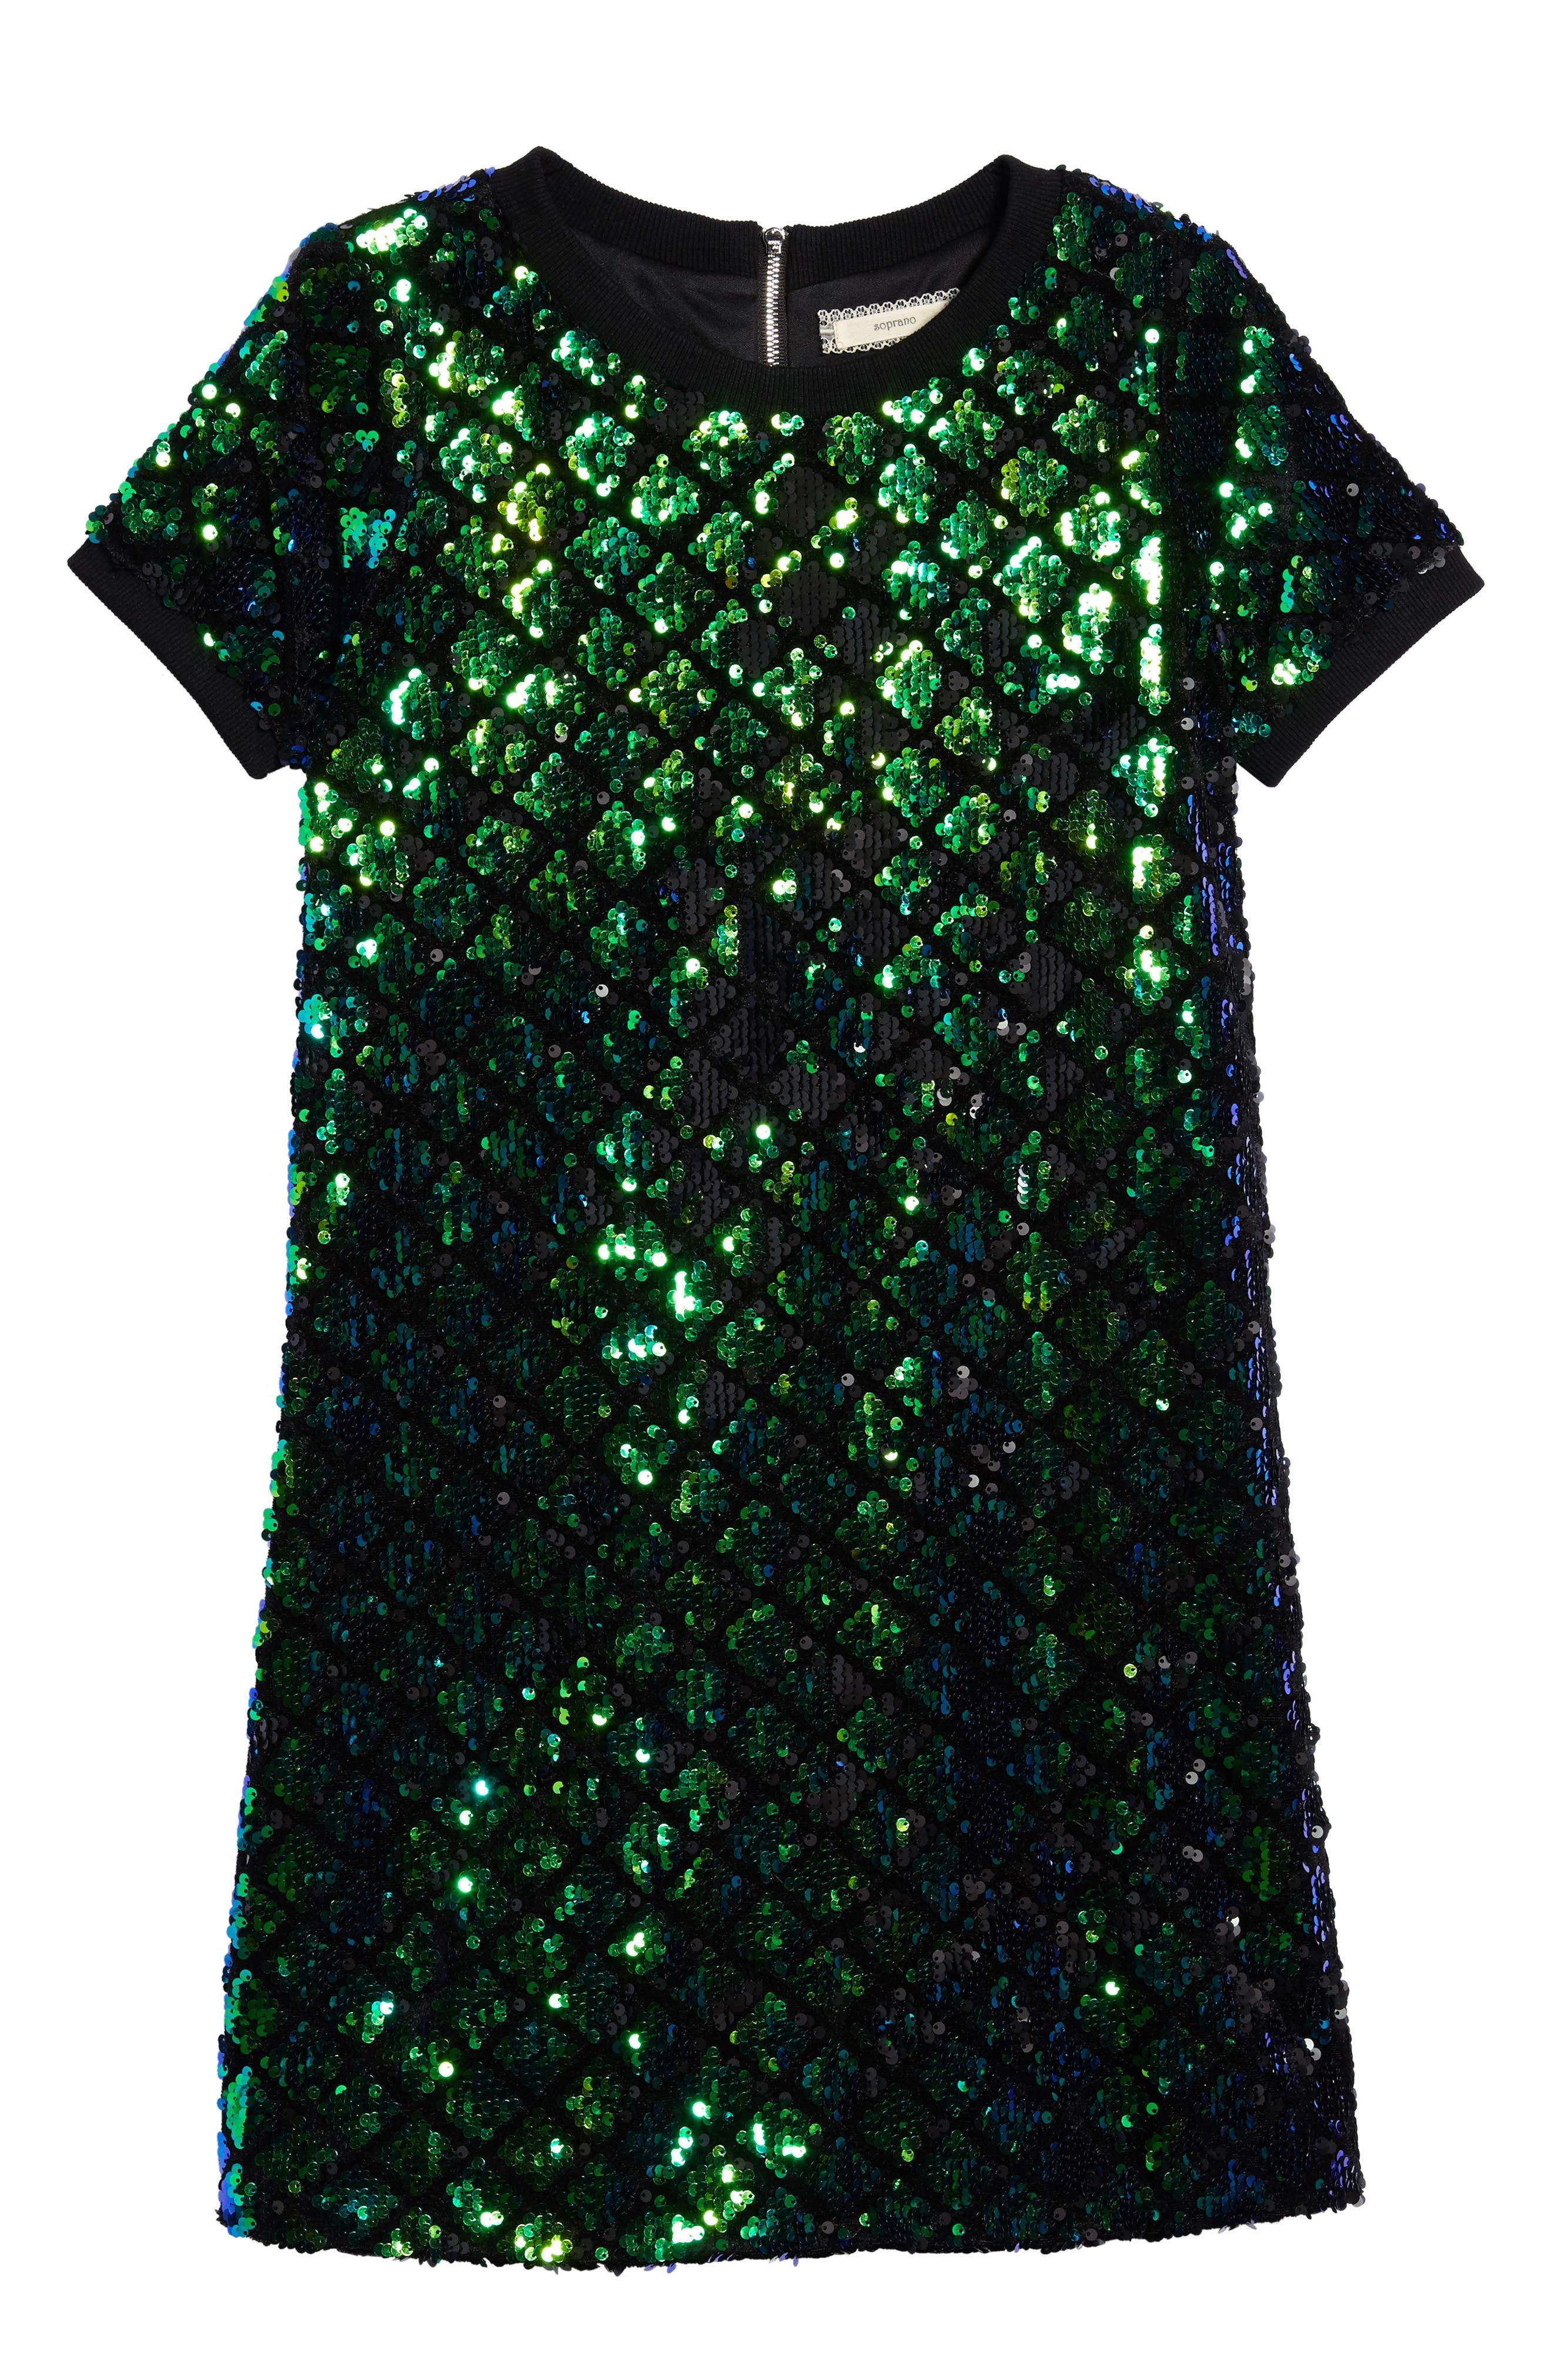 Main Image - Soprano Mermaid Sequin Shift Dress (Big Girls)